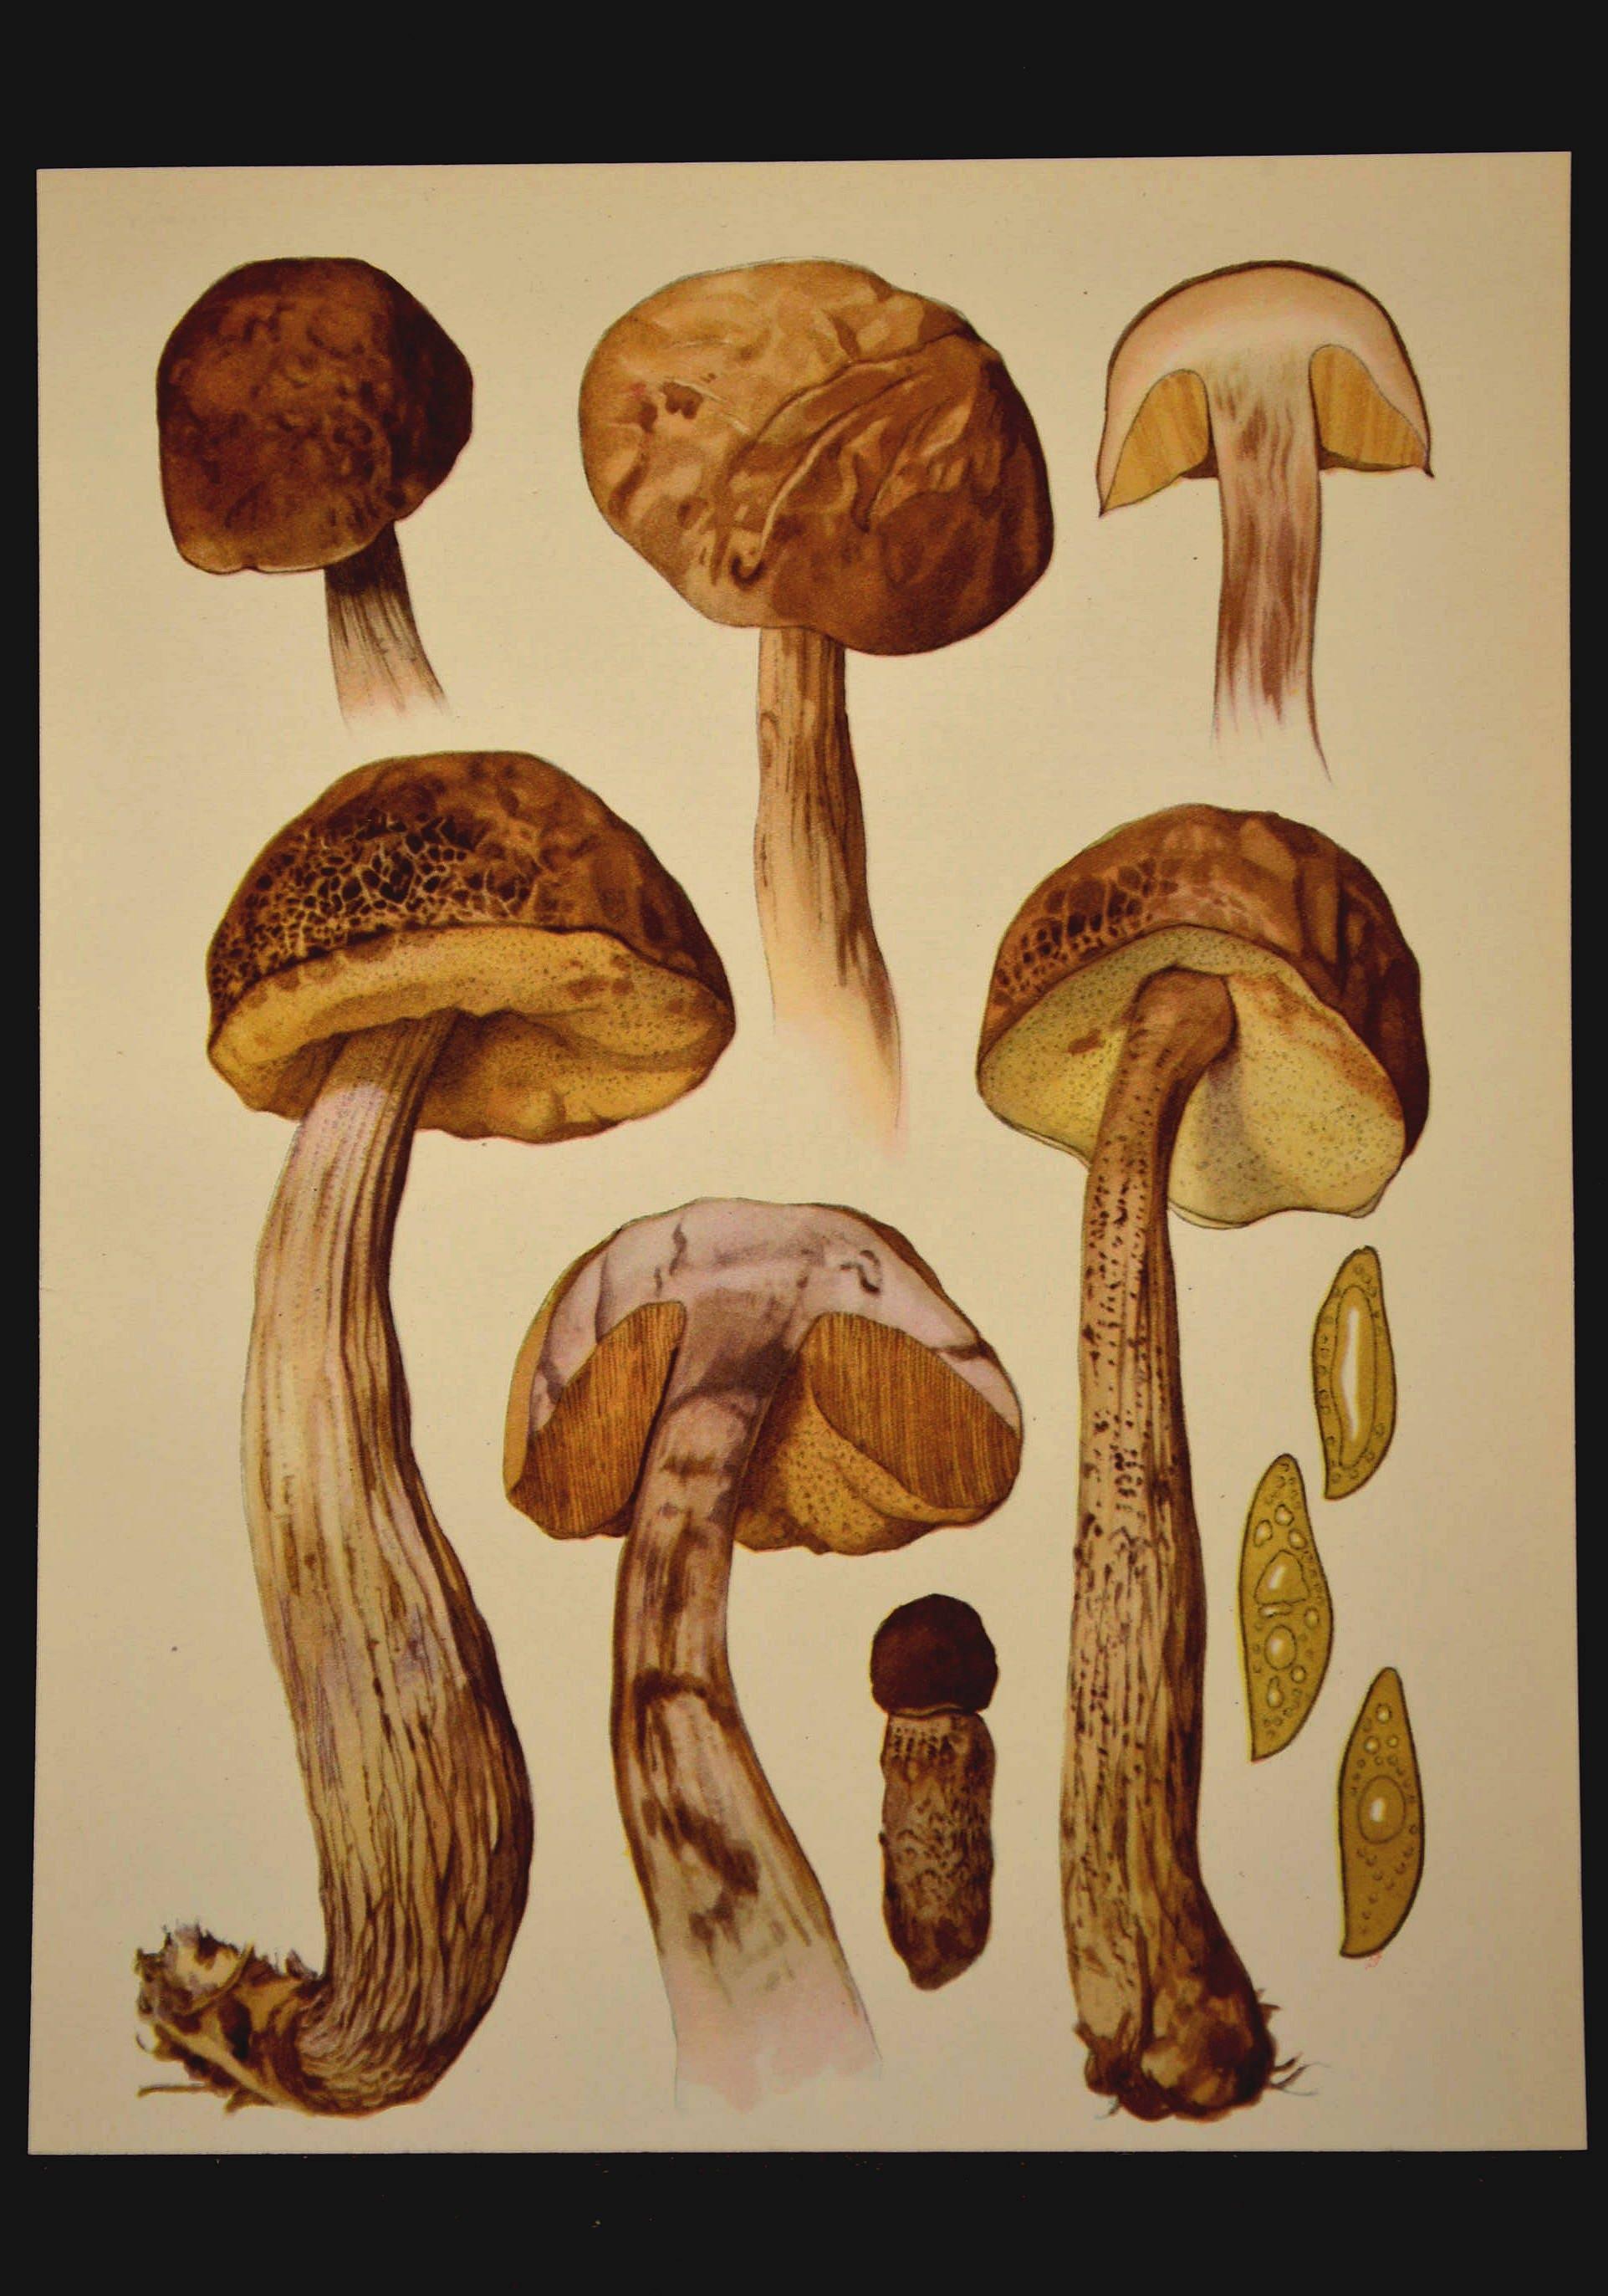 Edible Mushroom Wall Art Kitchen Print Vegetable Decor